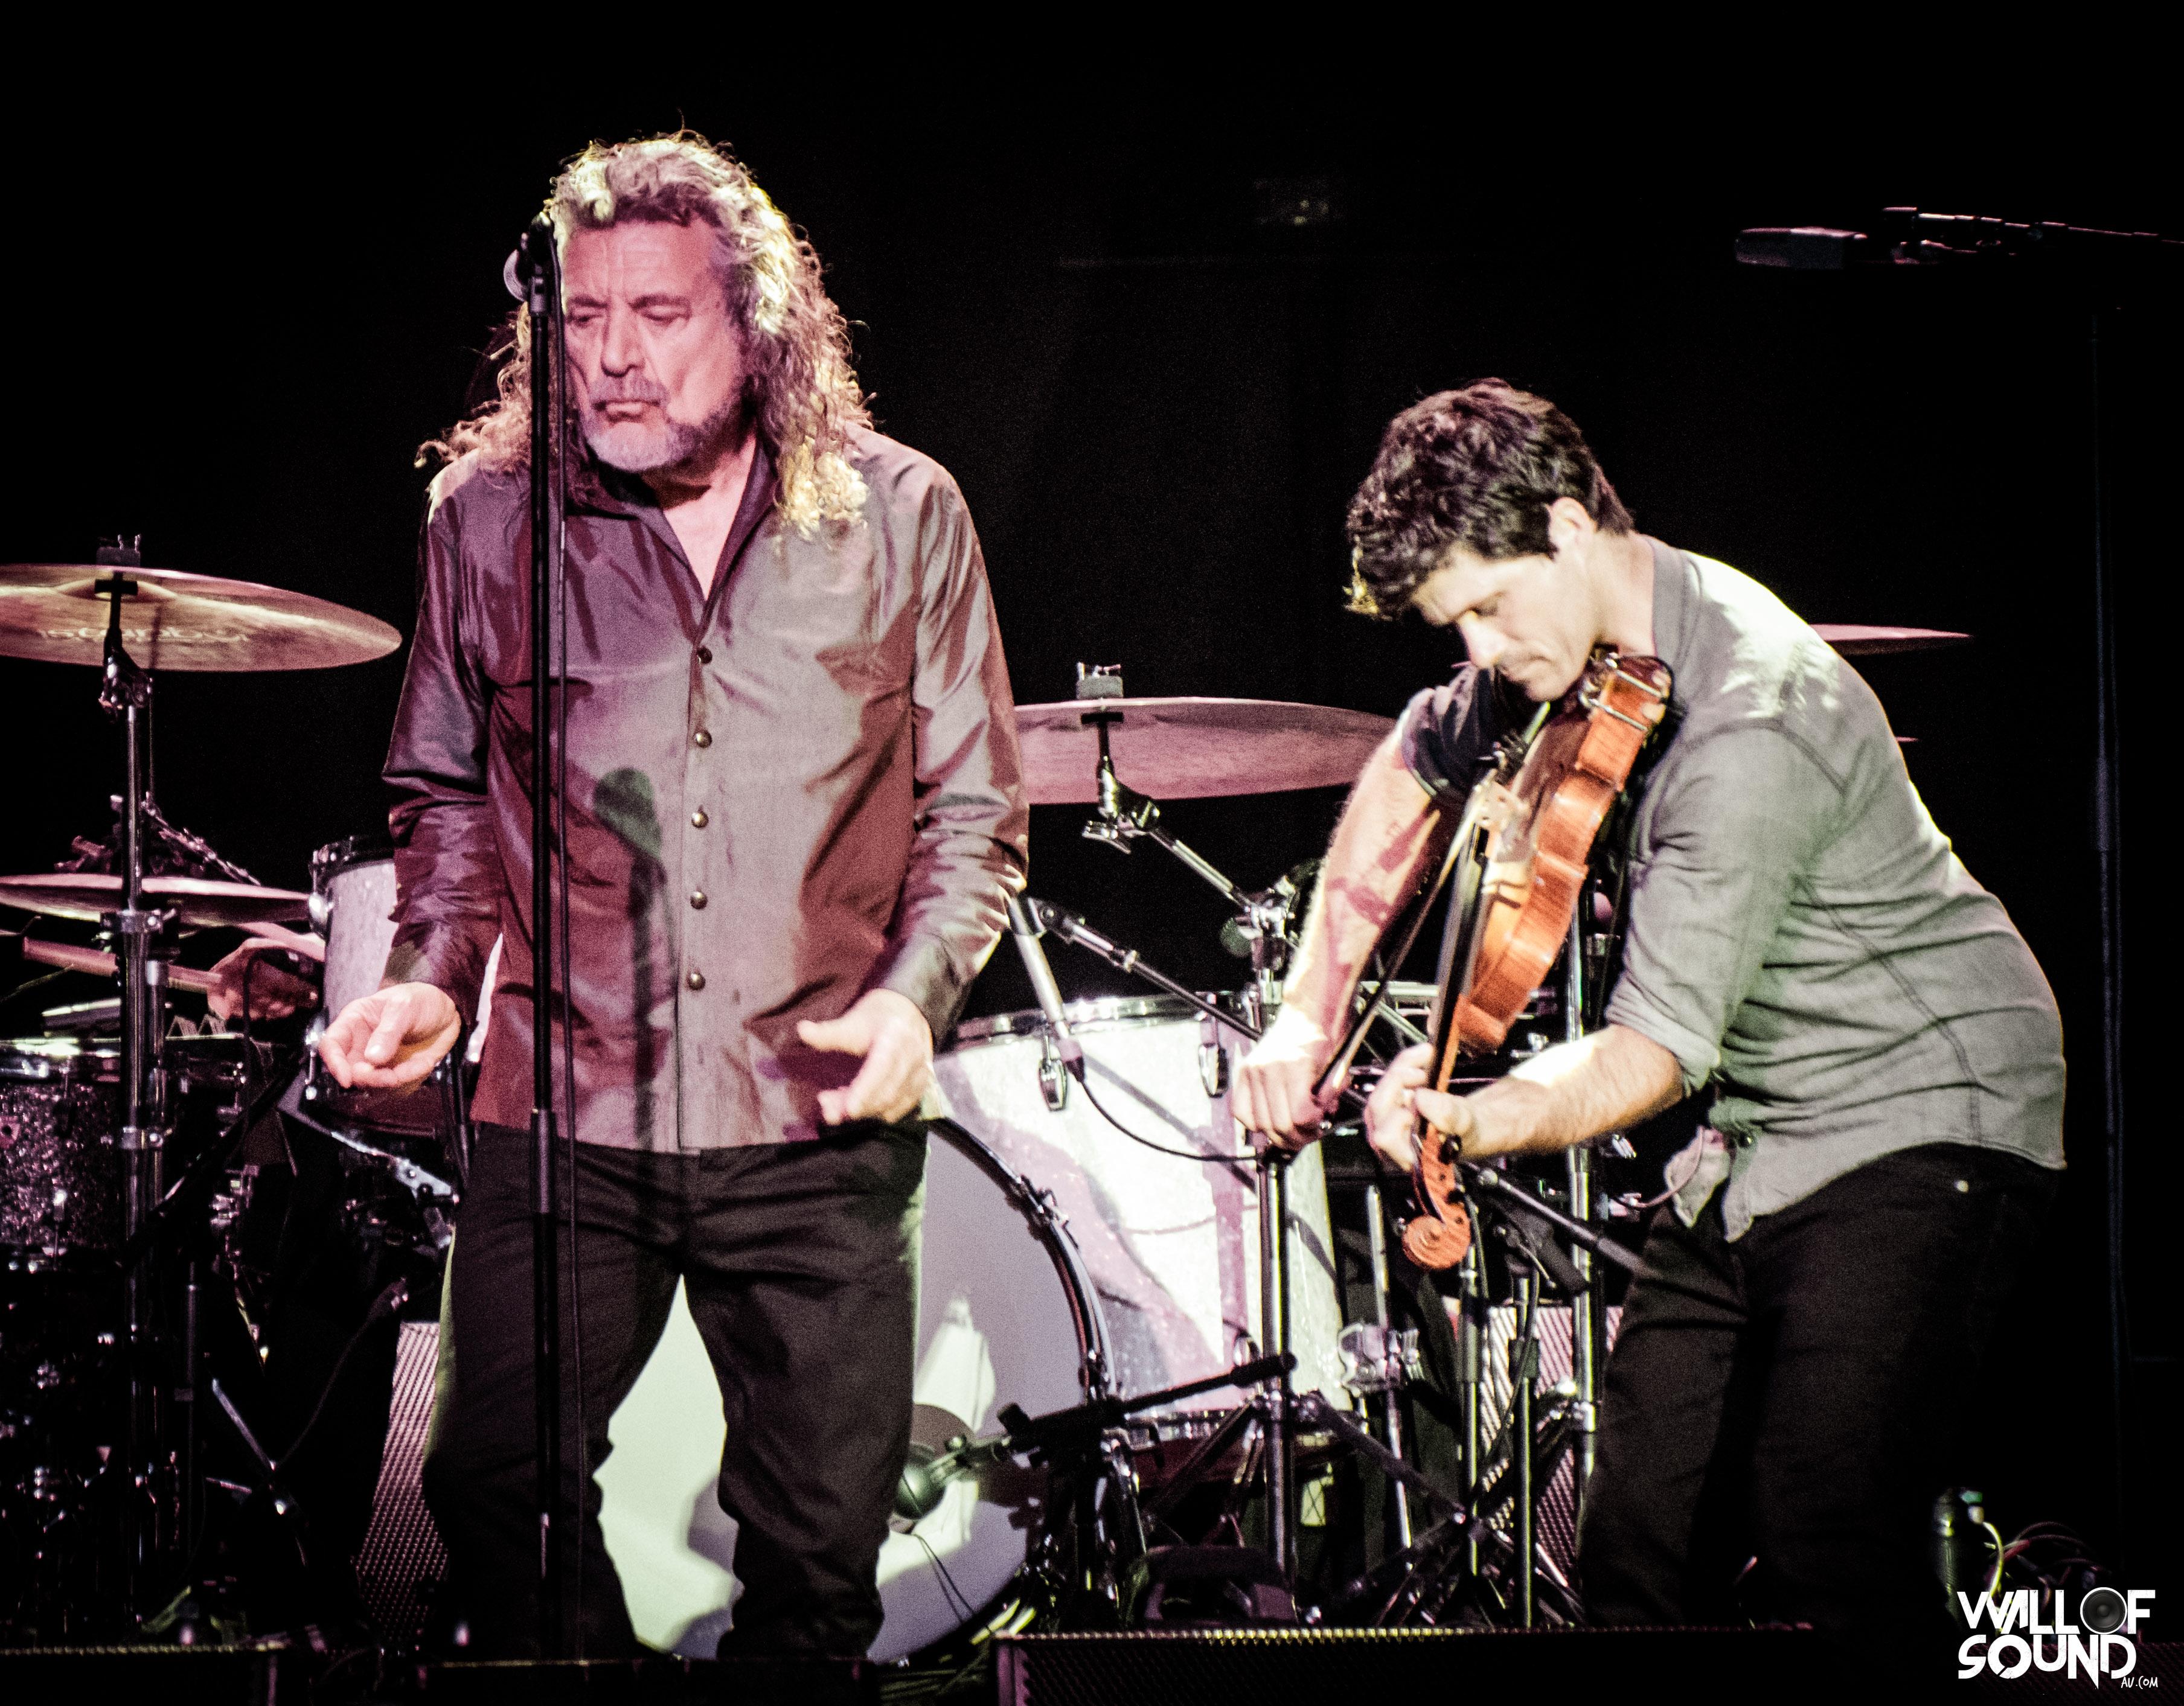 Robert Plant @ Bluesfest 18-26